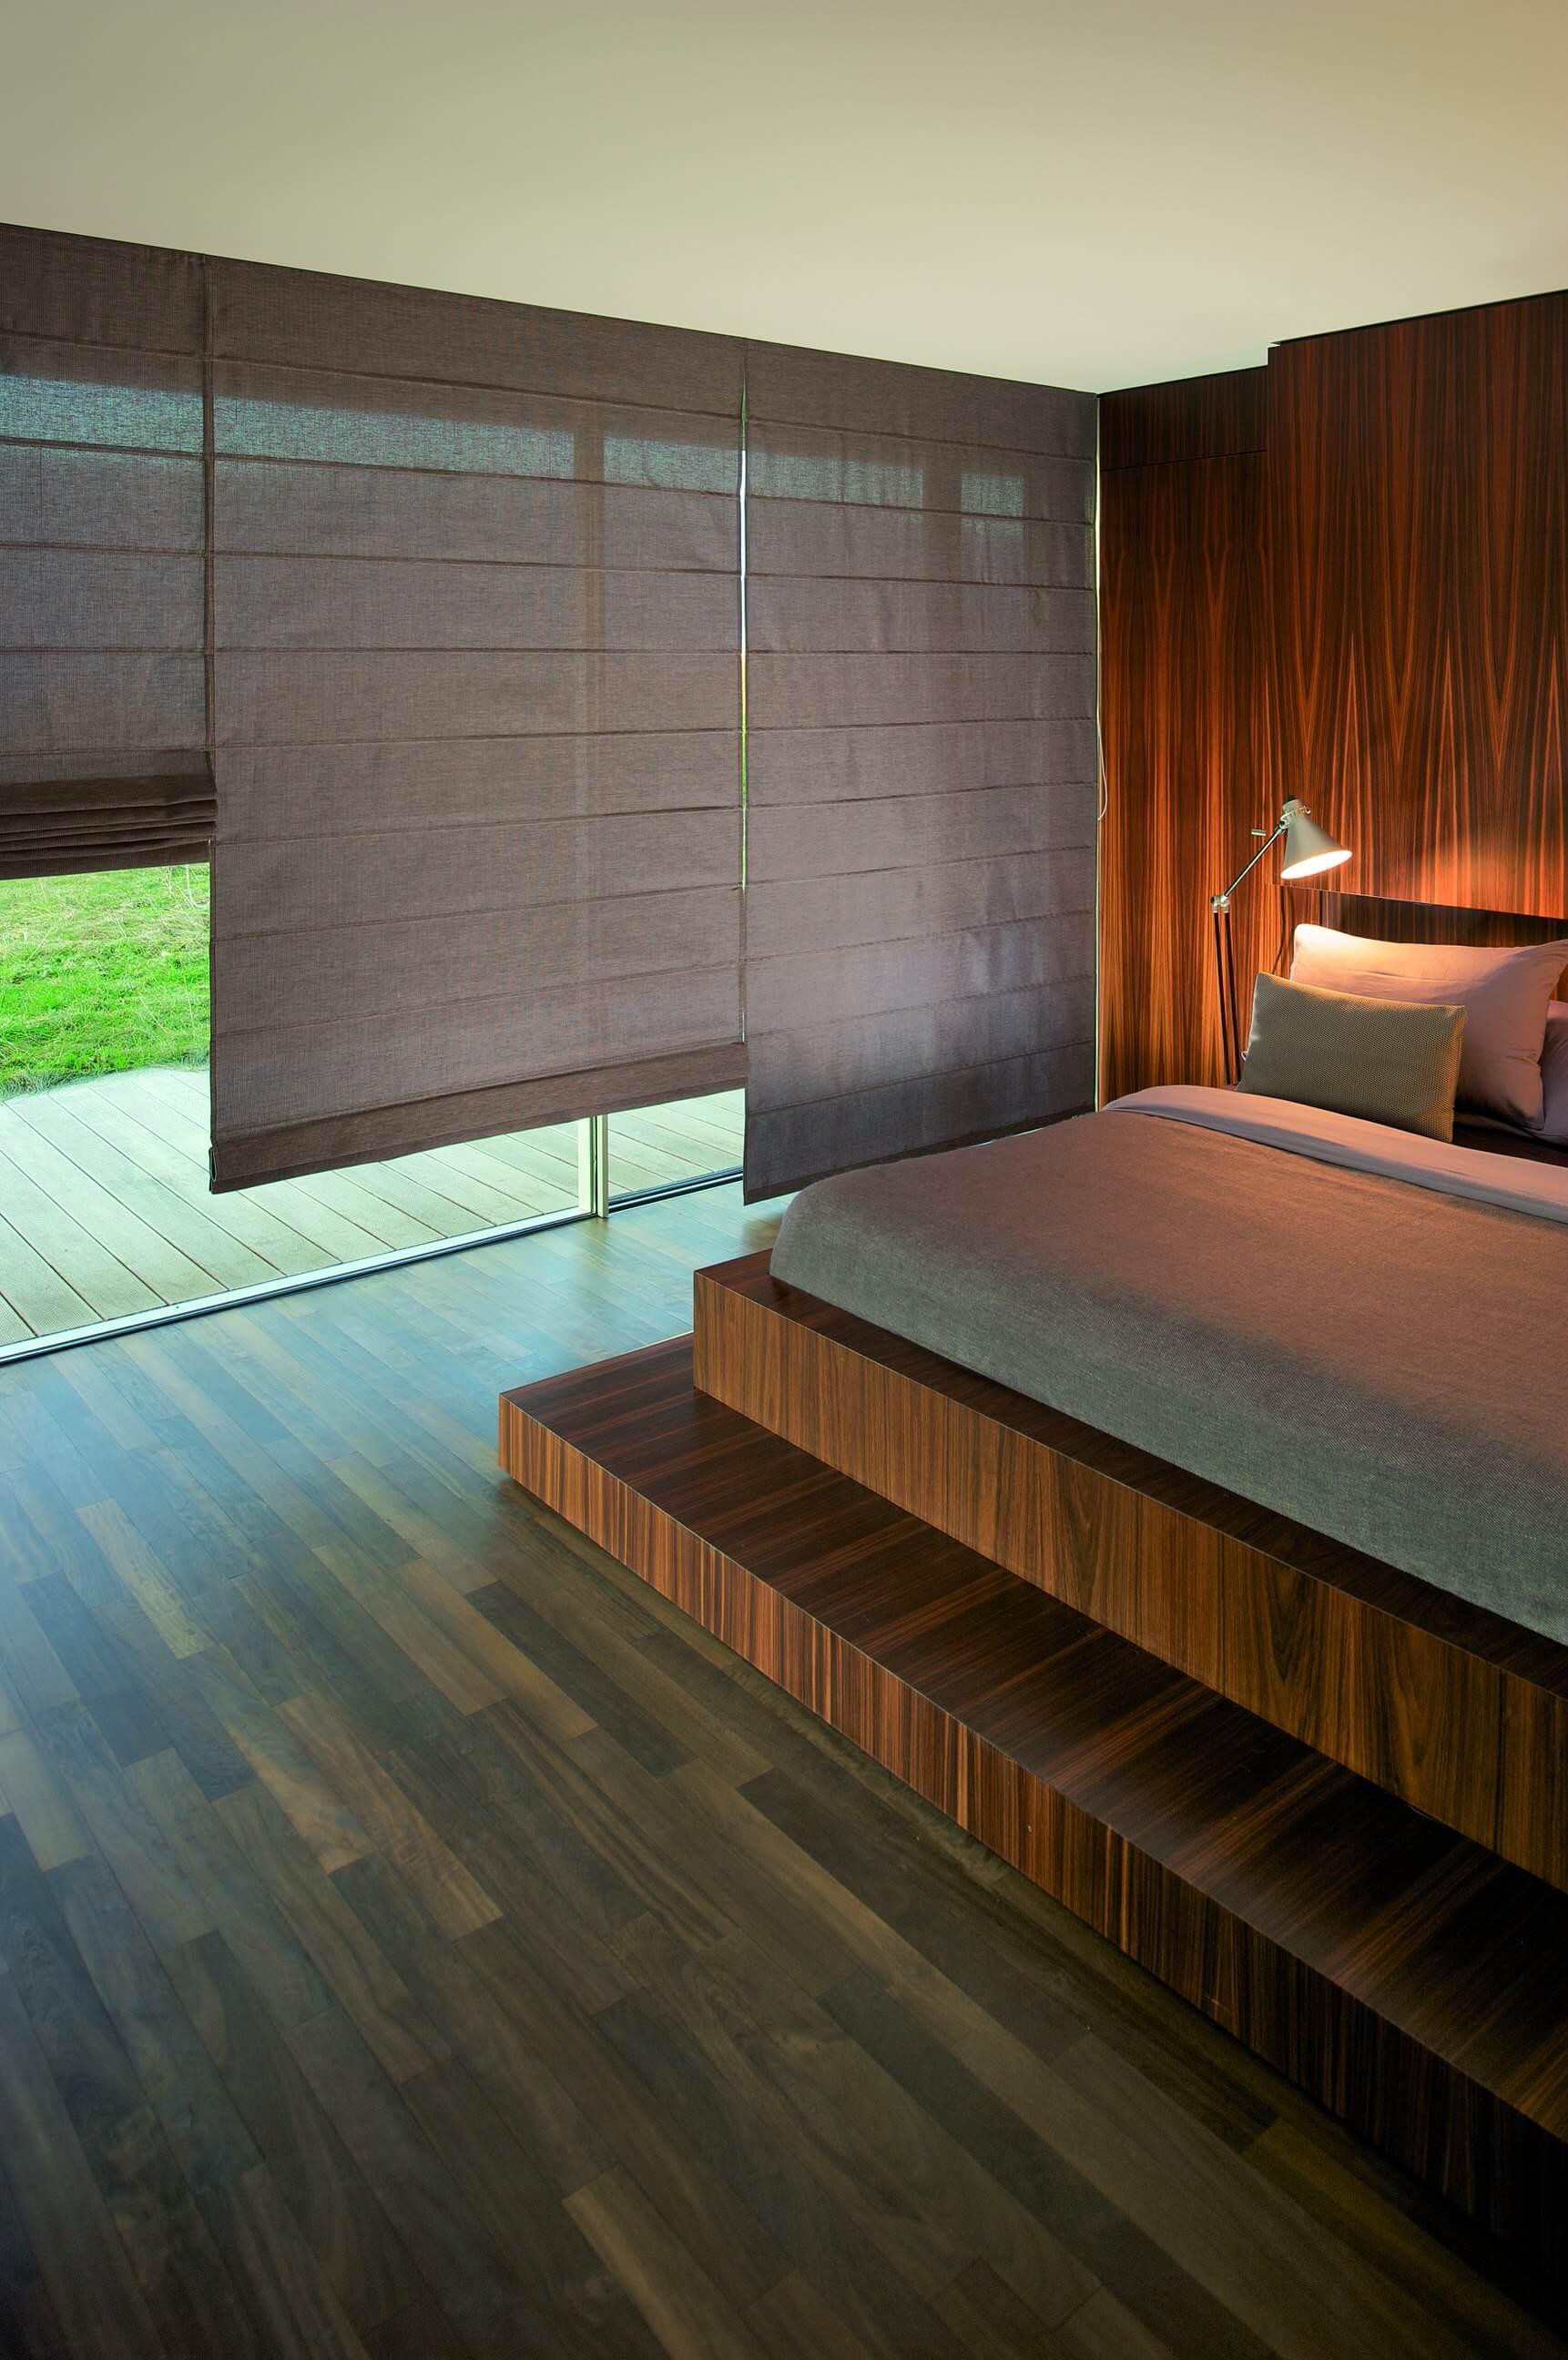 Raffrollos in berlin anfertigen lassen adler wohndesign for Wohndesign berlin